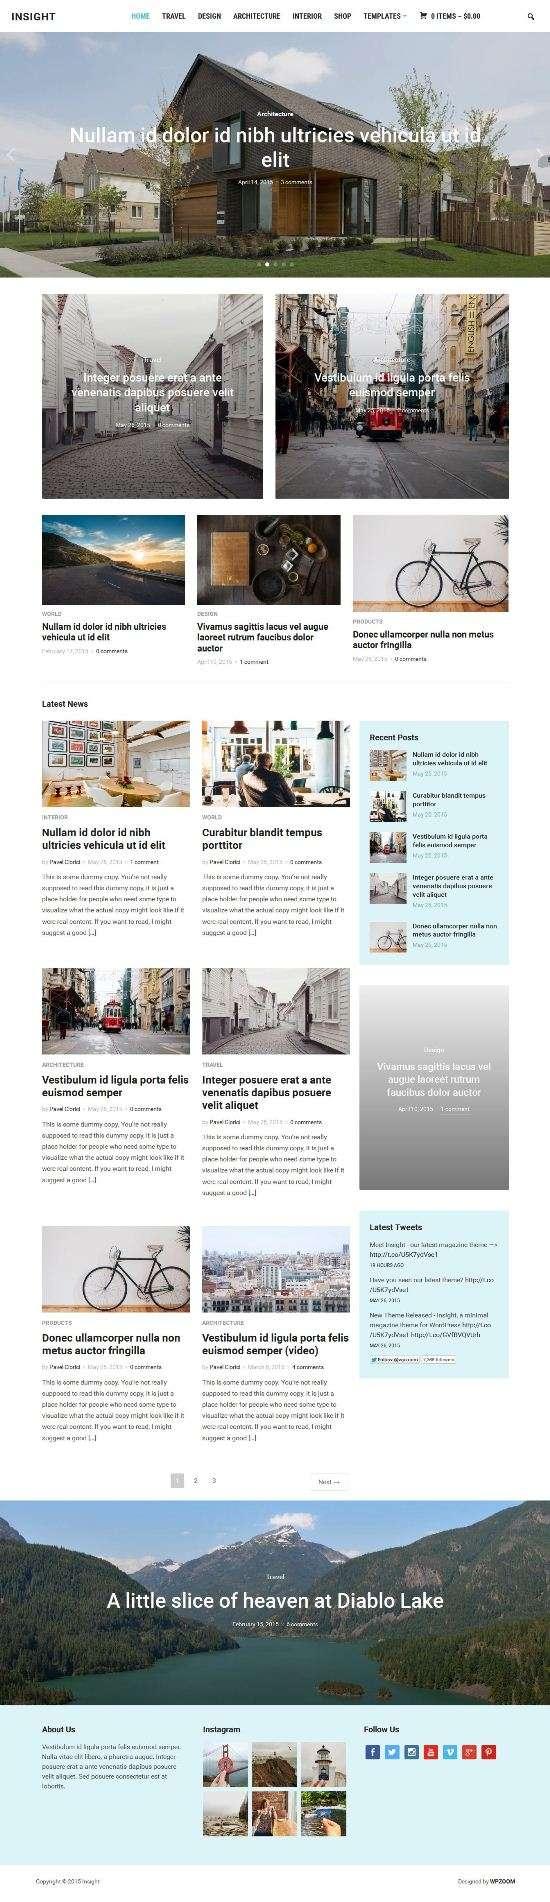 insight wpzoom magazine wordpress theme 01 - Insight WordPress Theme